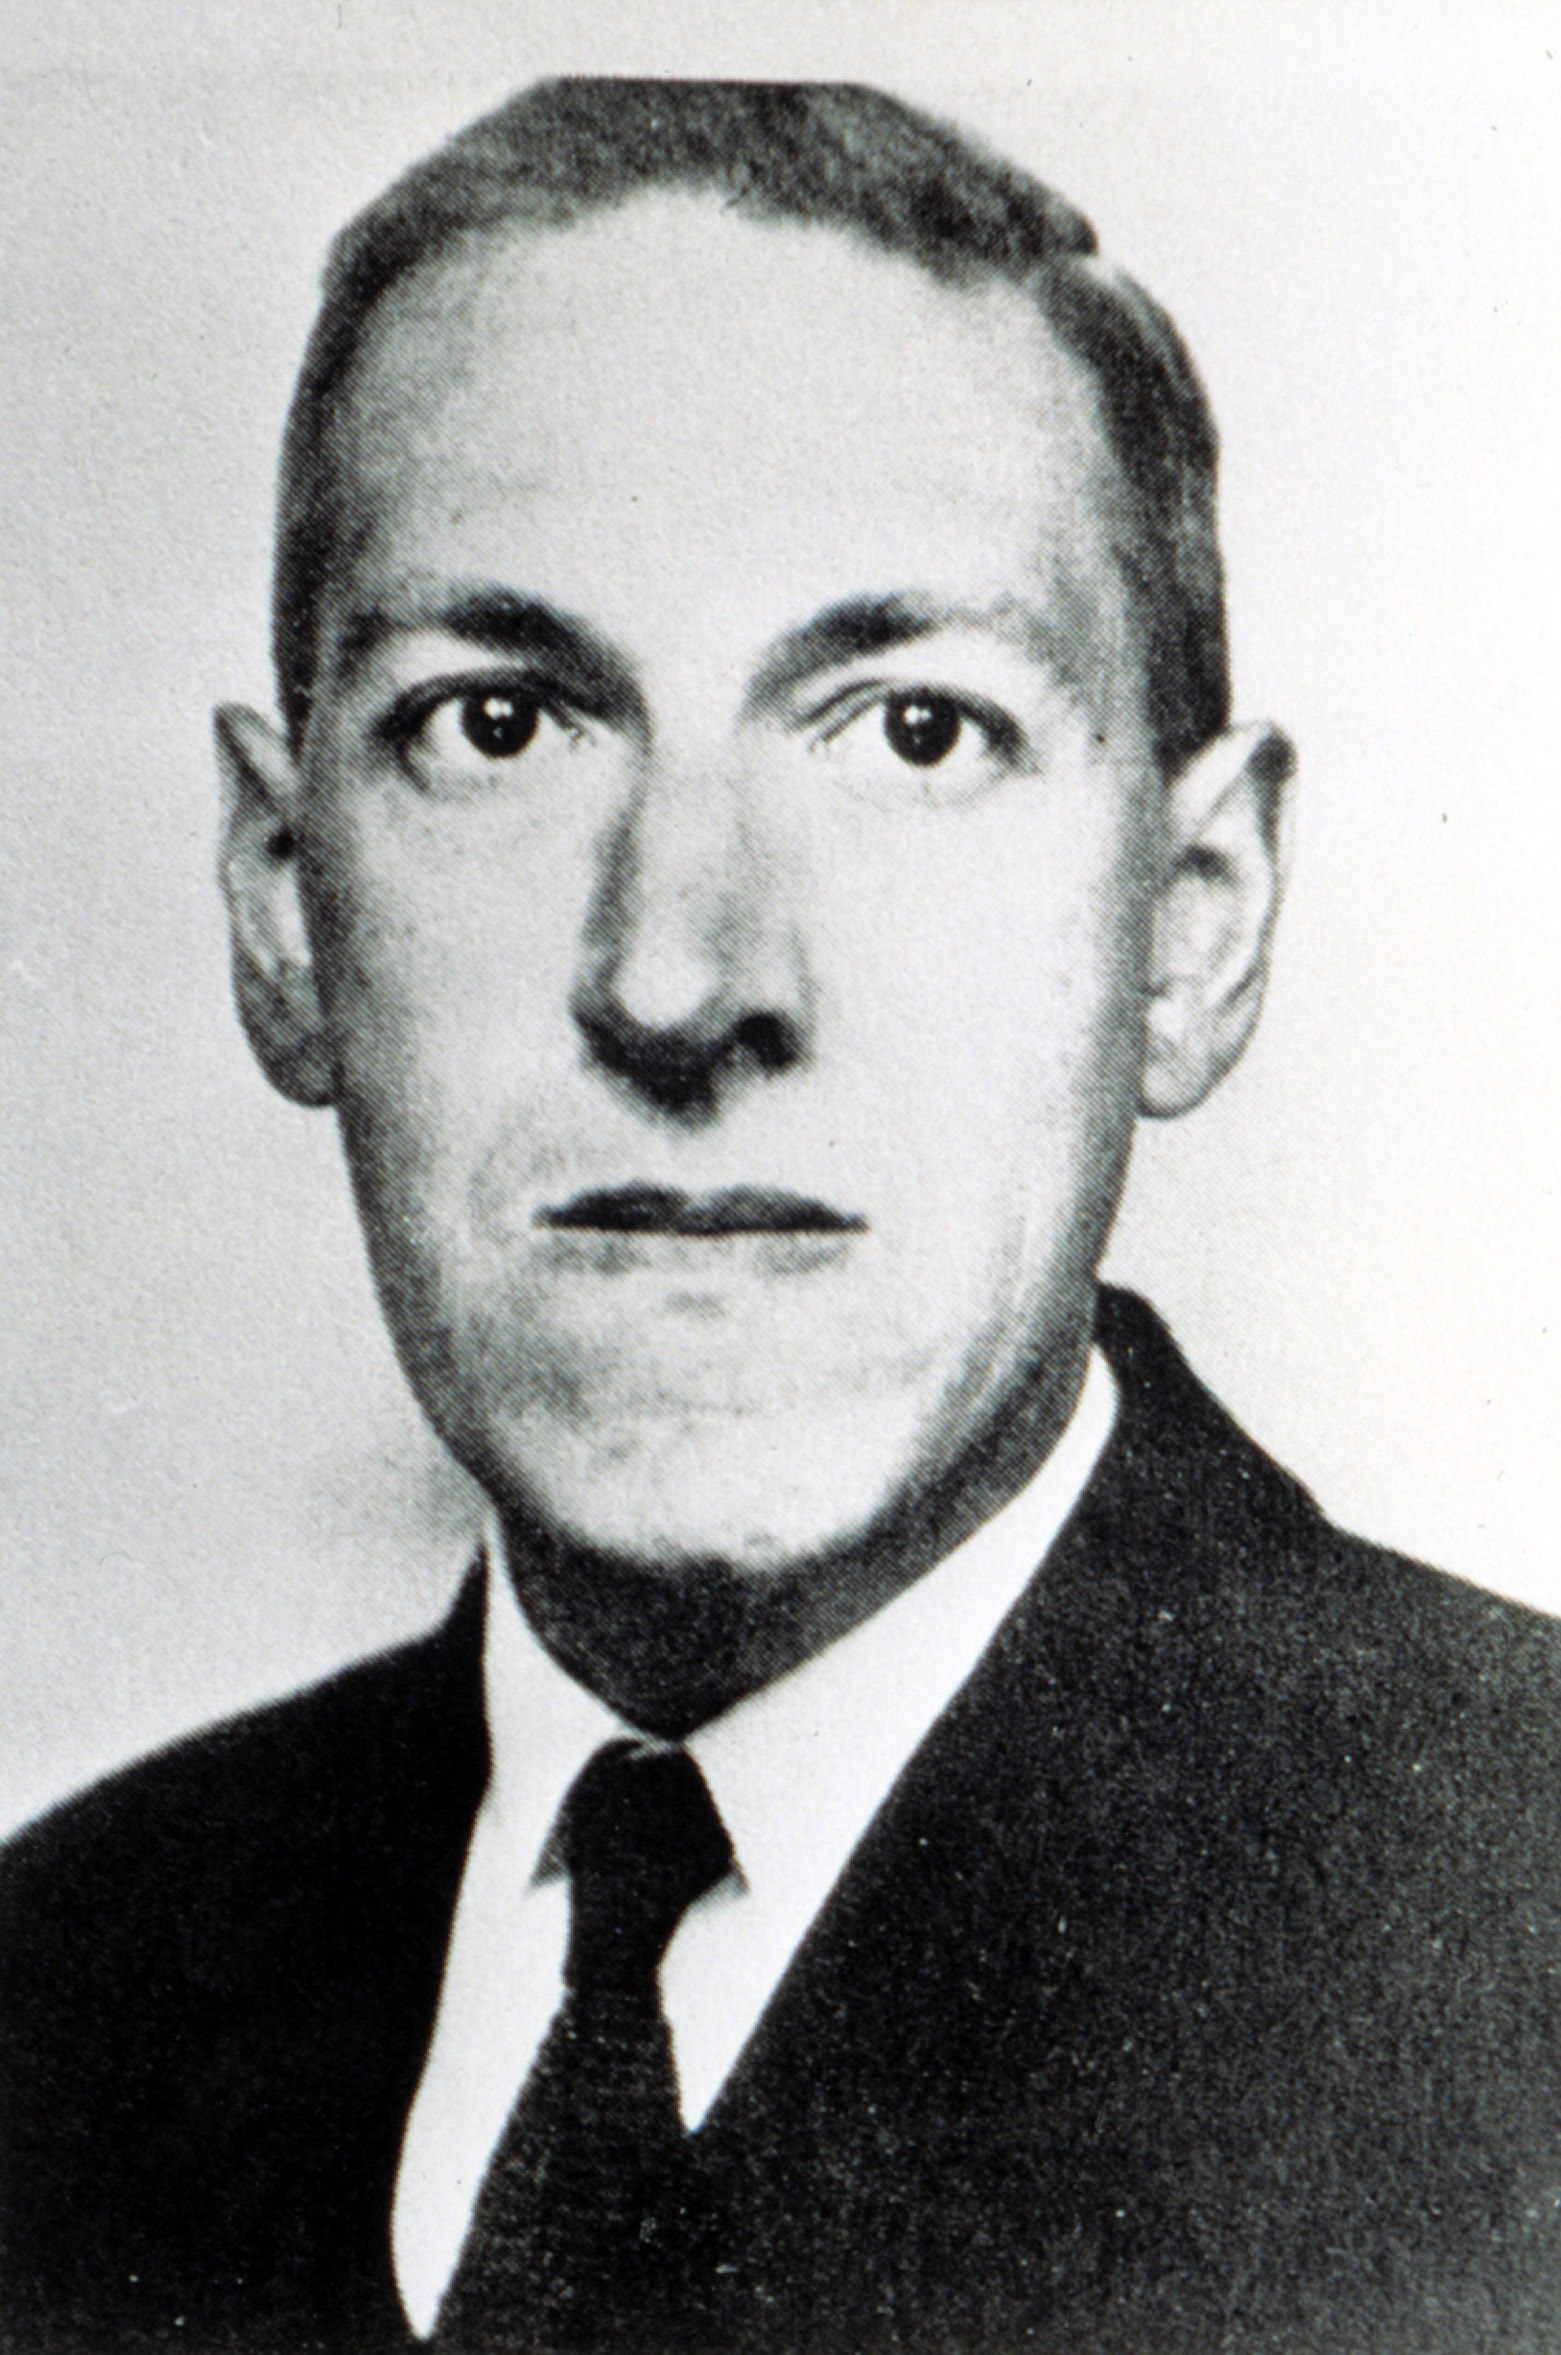 H.P. Lovecraft, (1890-1937), American writer, circa 1934.